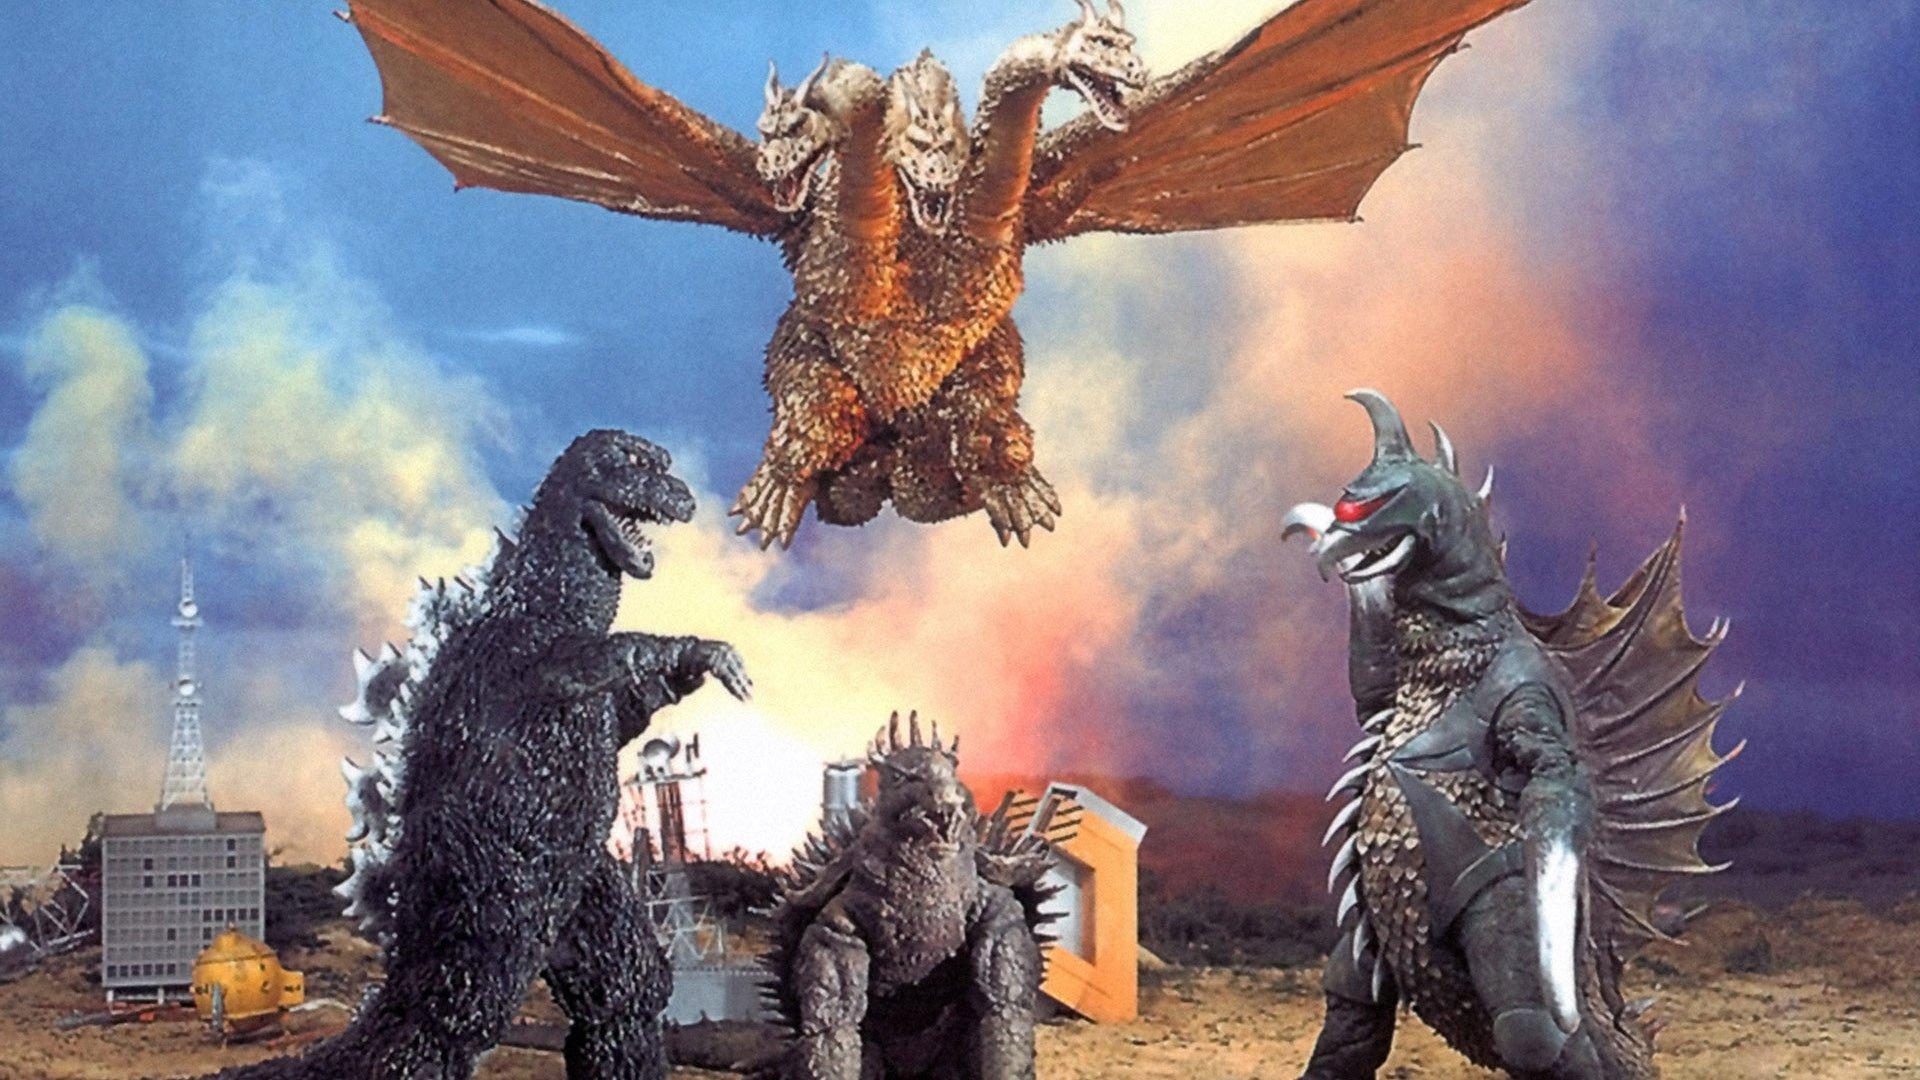 5 Godzilla vs Gigan HD Wallpapers Background Images   Wallpaper 1920x1080